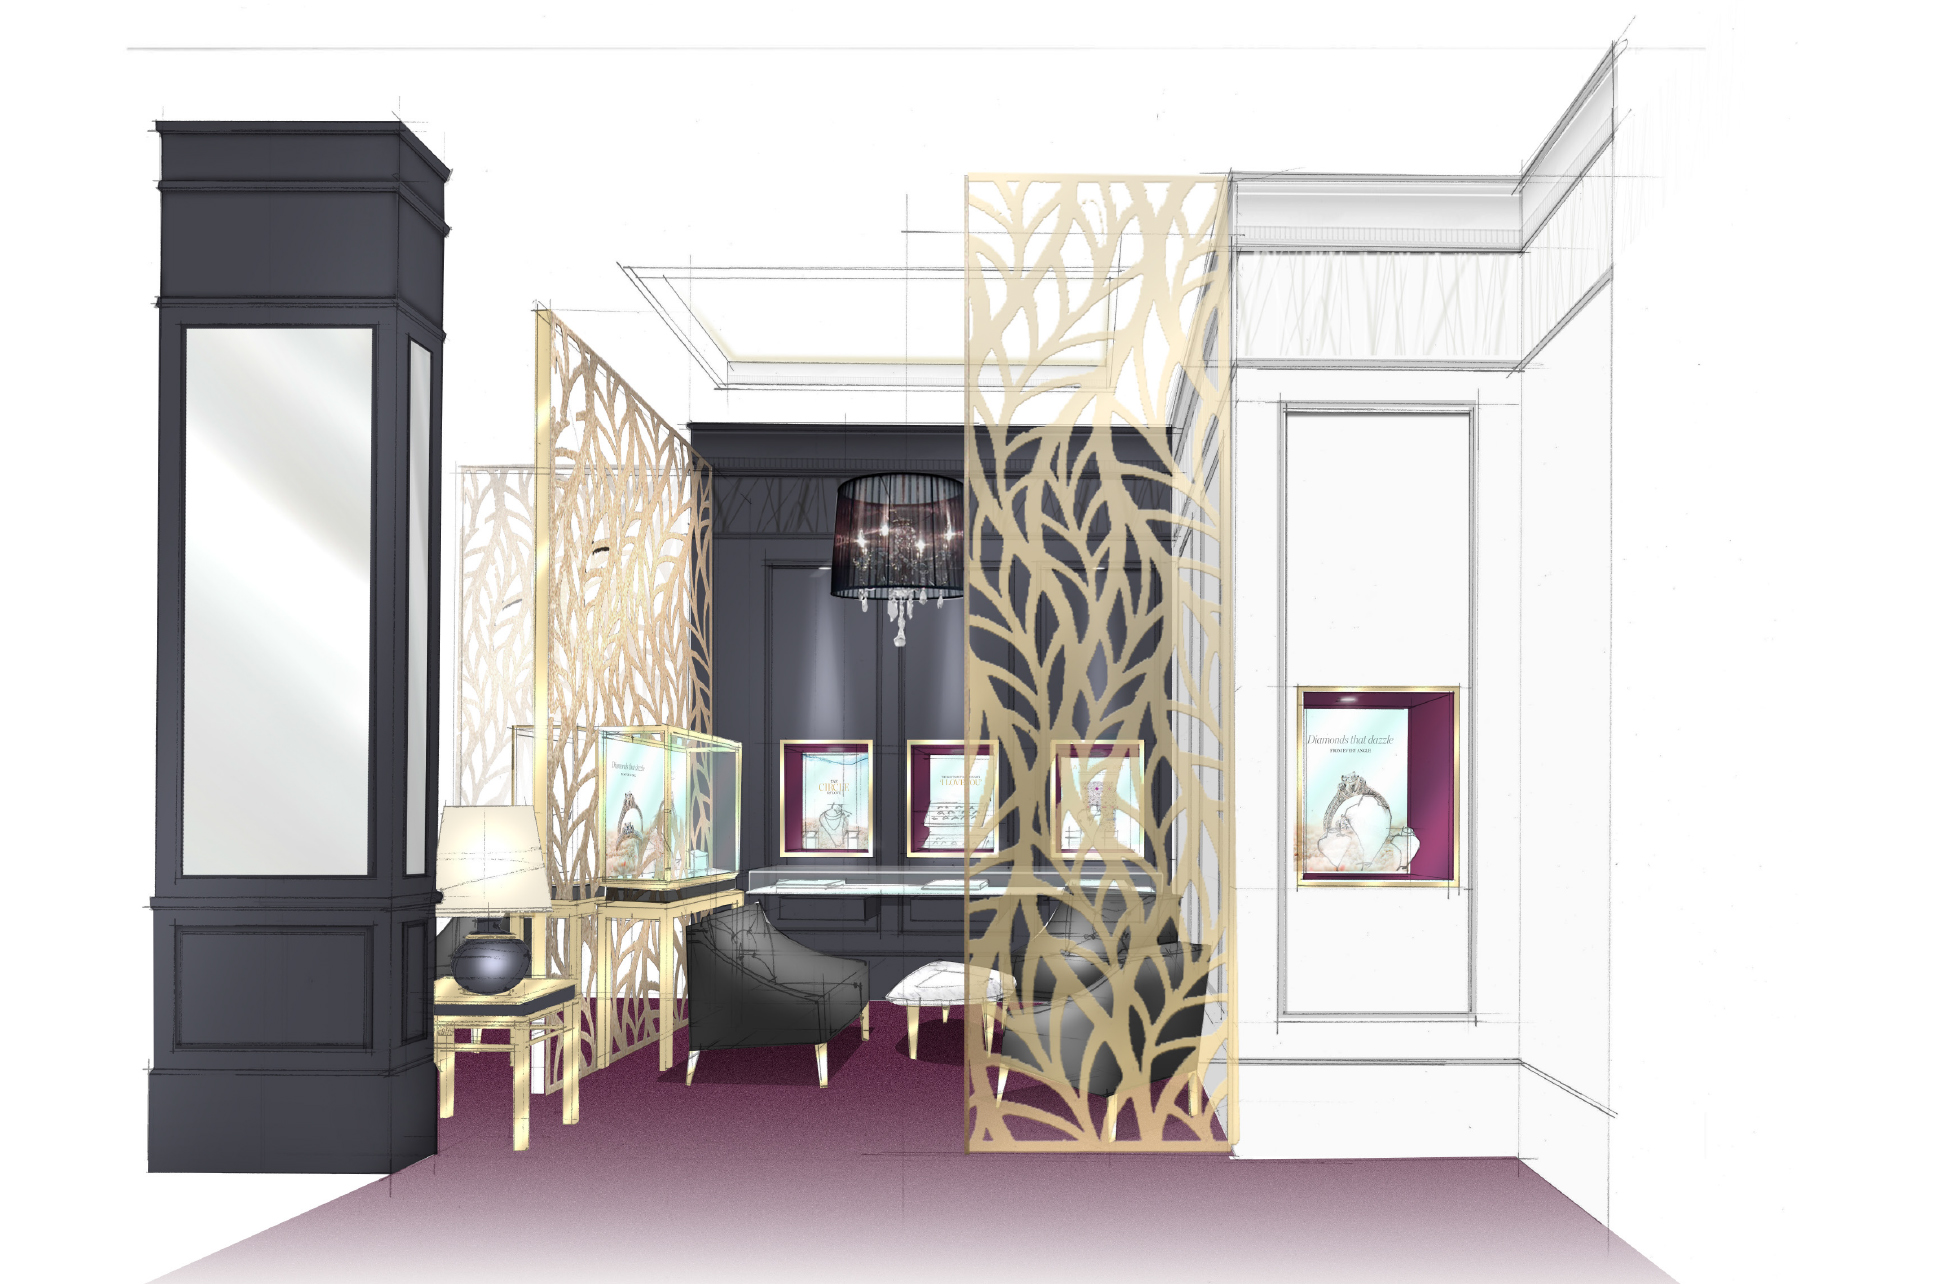 princesst_consultation_areas_concept